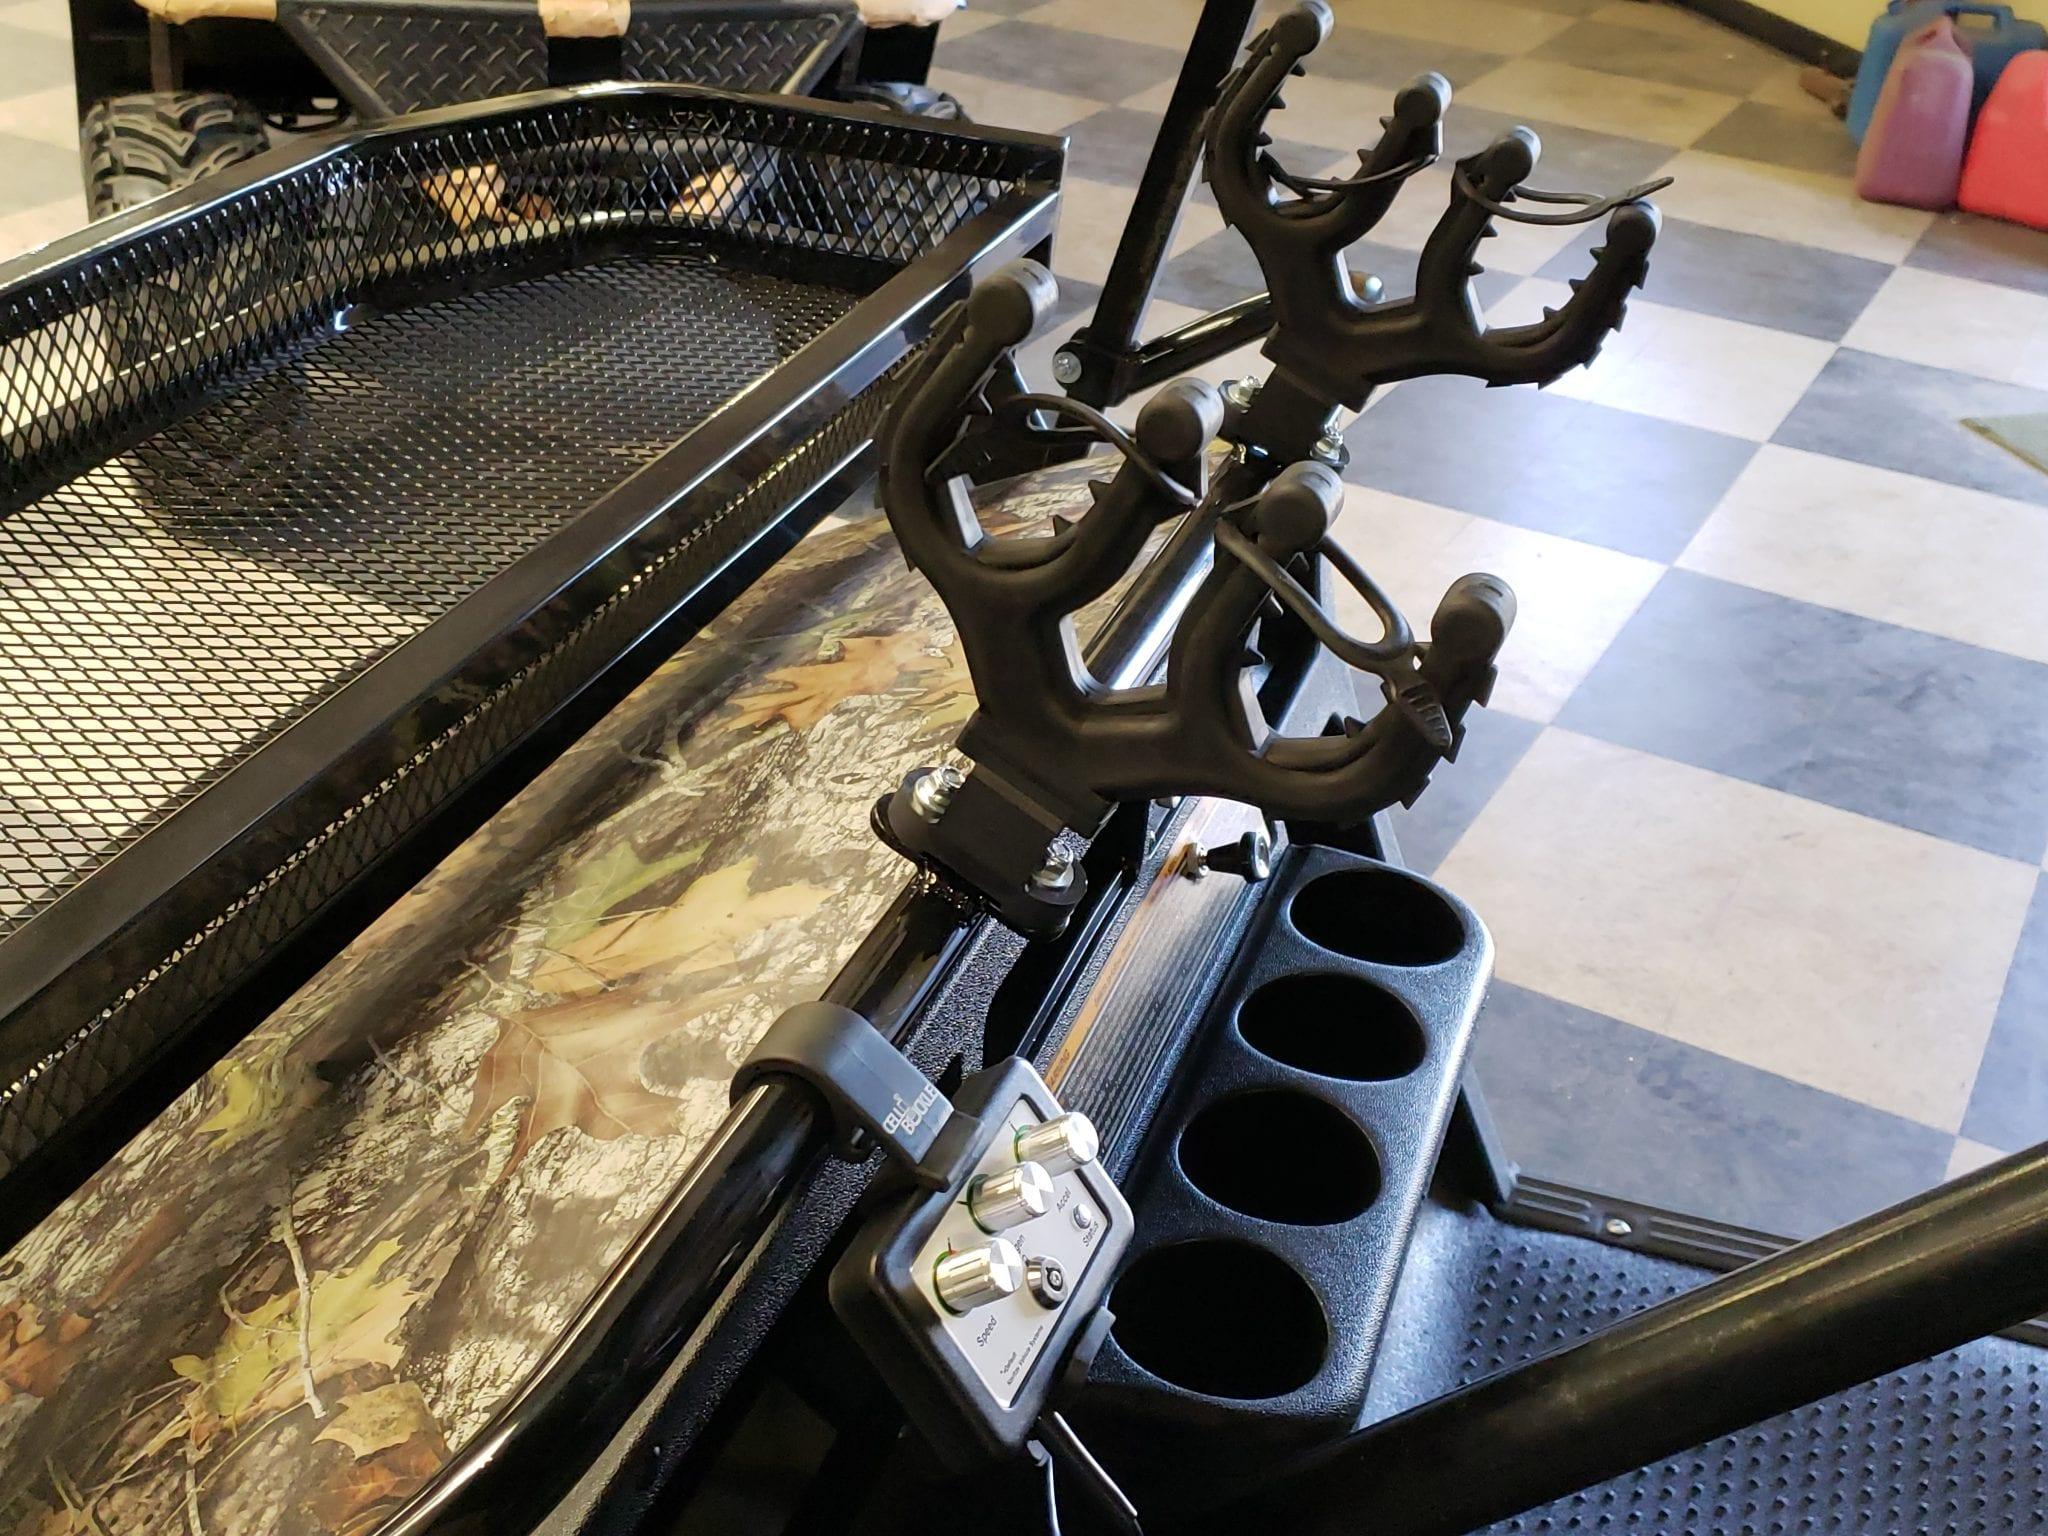 beast double gun rack